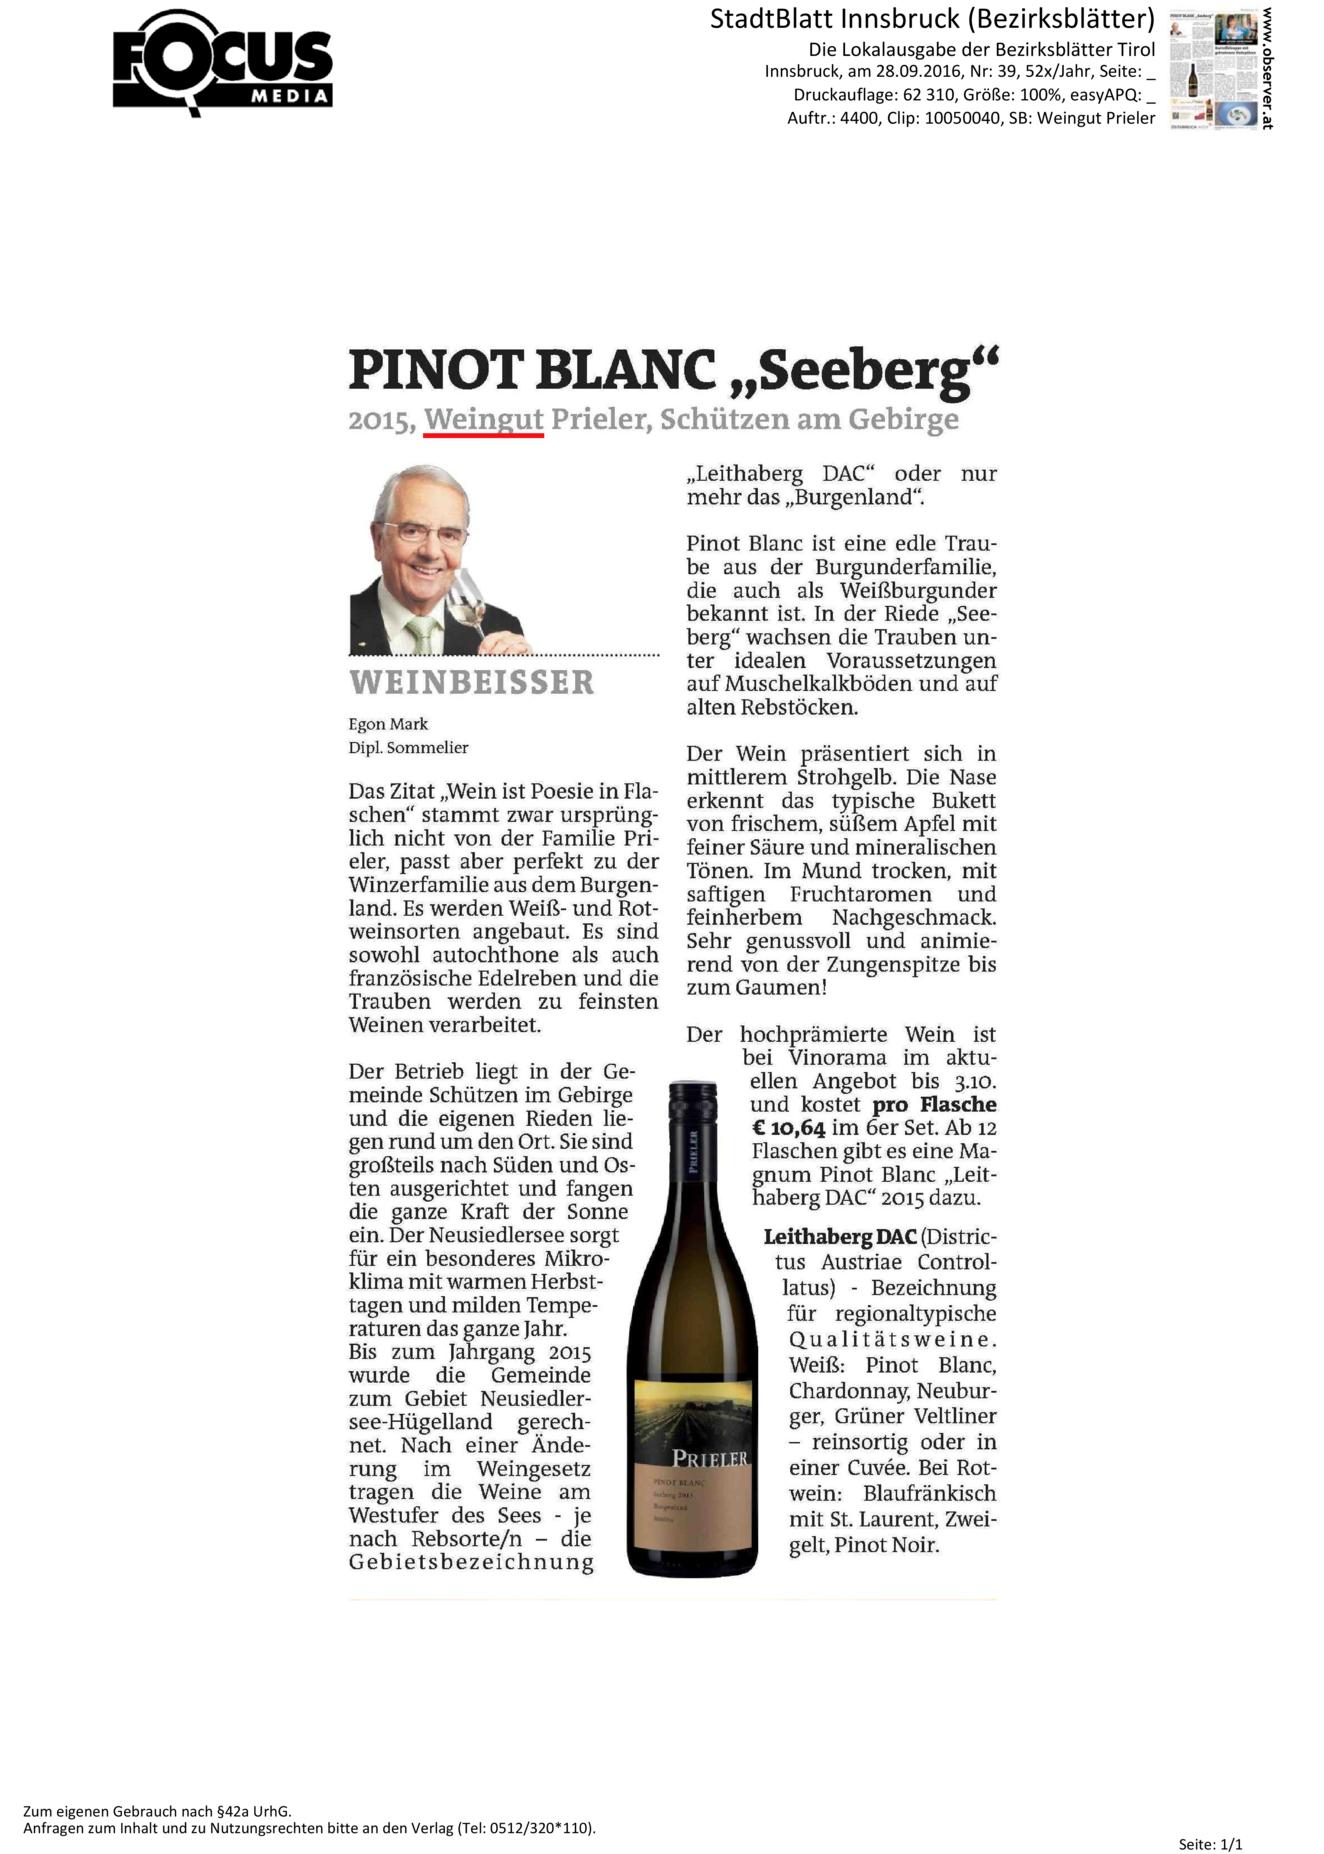 Pinot Blanc Seeberg 2015